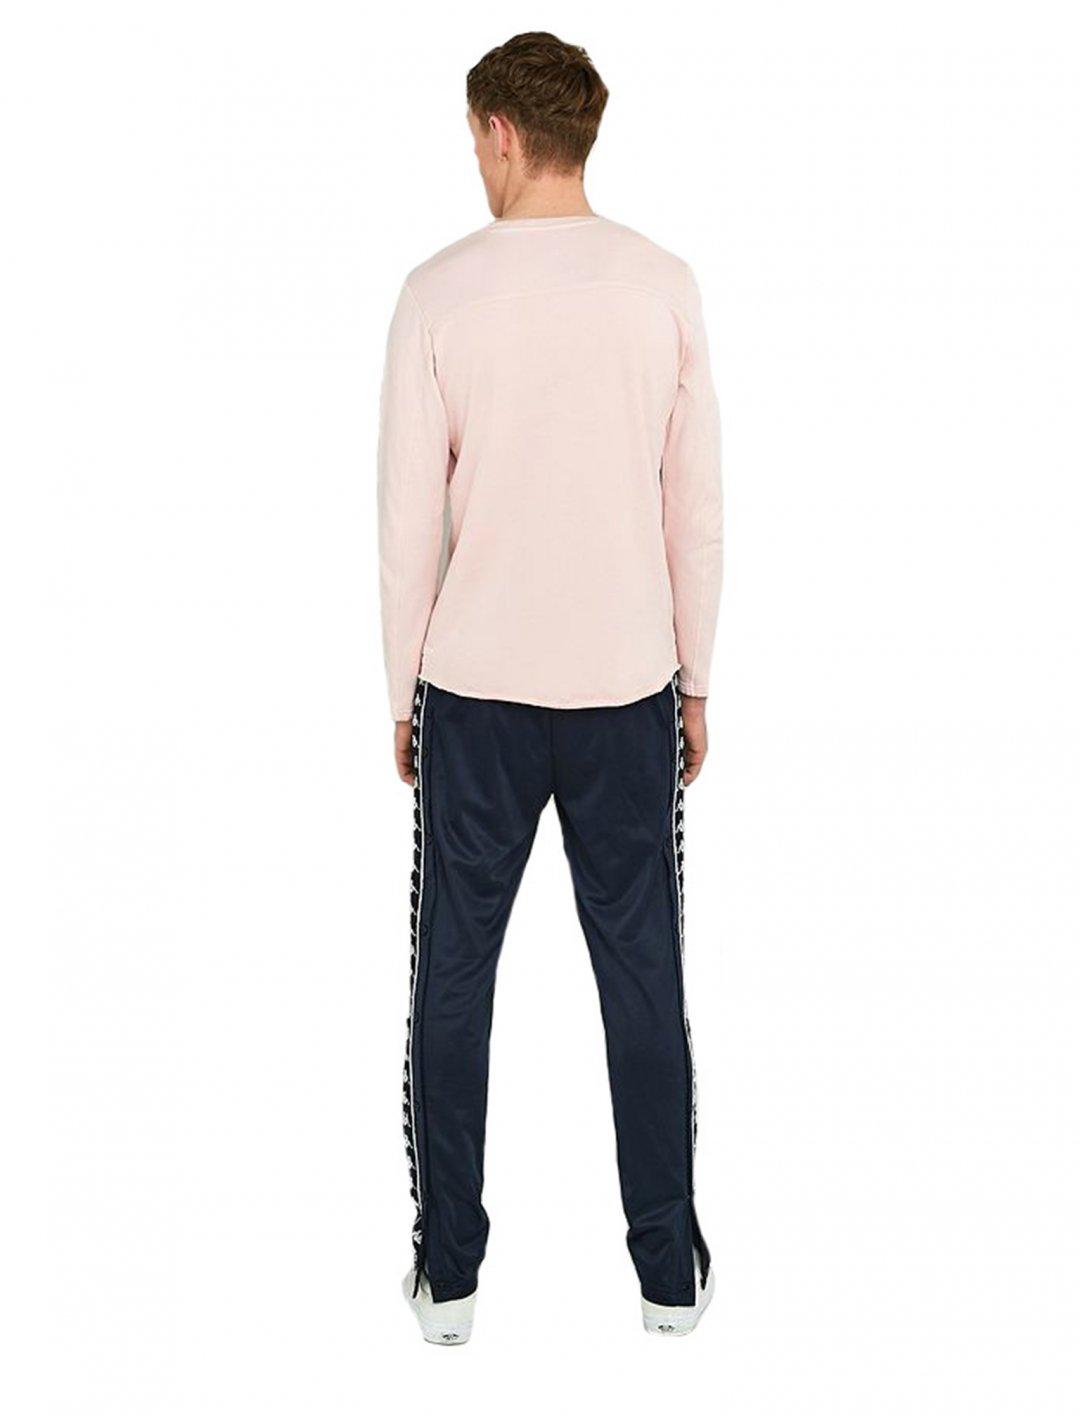 Kappa Track Pants Clothing Kappa